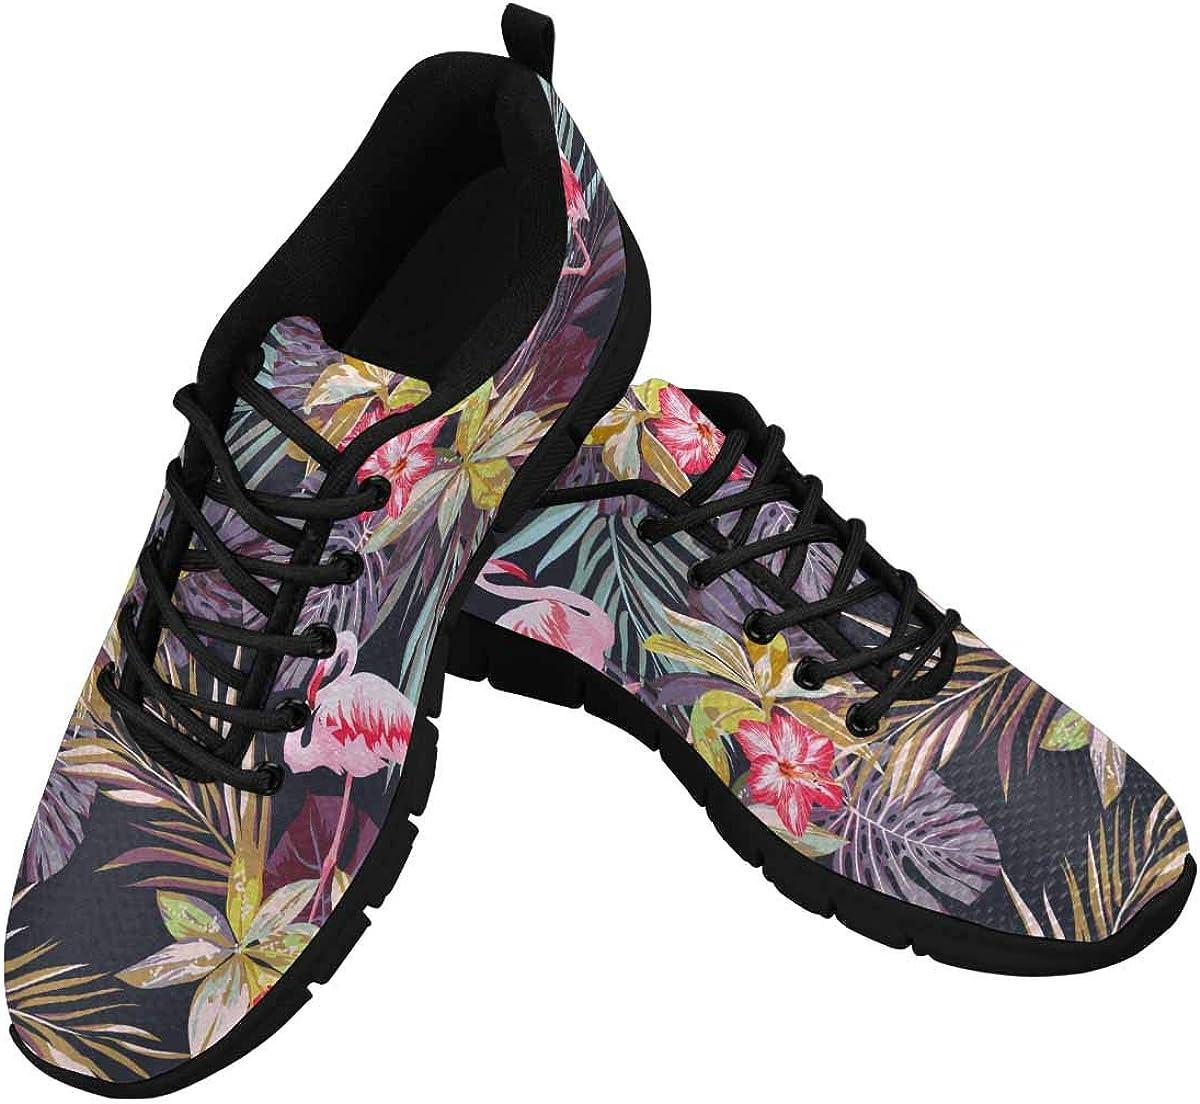 InterestPrint Tropical Max 81% OFF Regular discount Summer Flamingo Athletic Wa Women's Birds